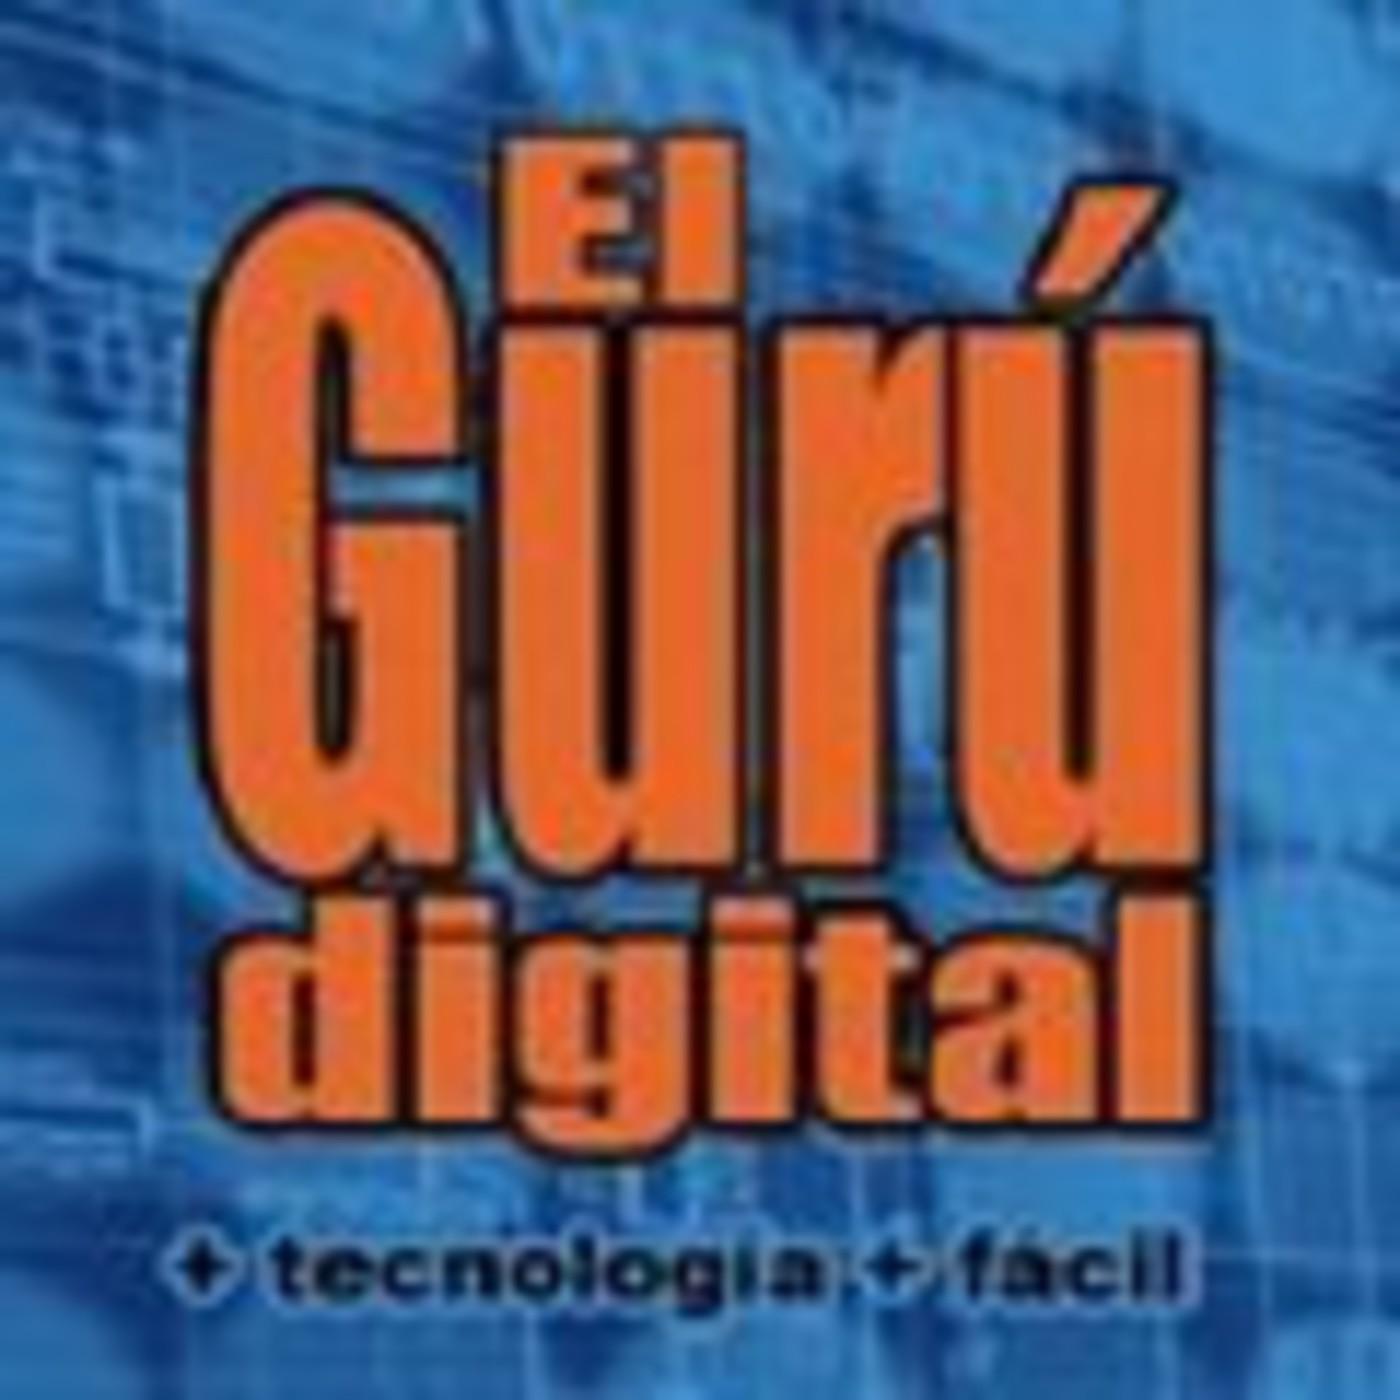 EL Gurú Digital